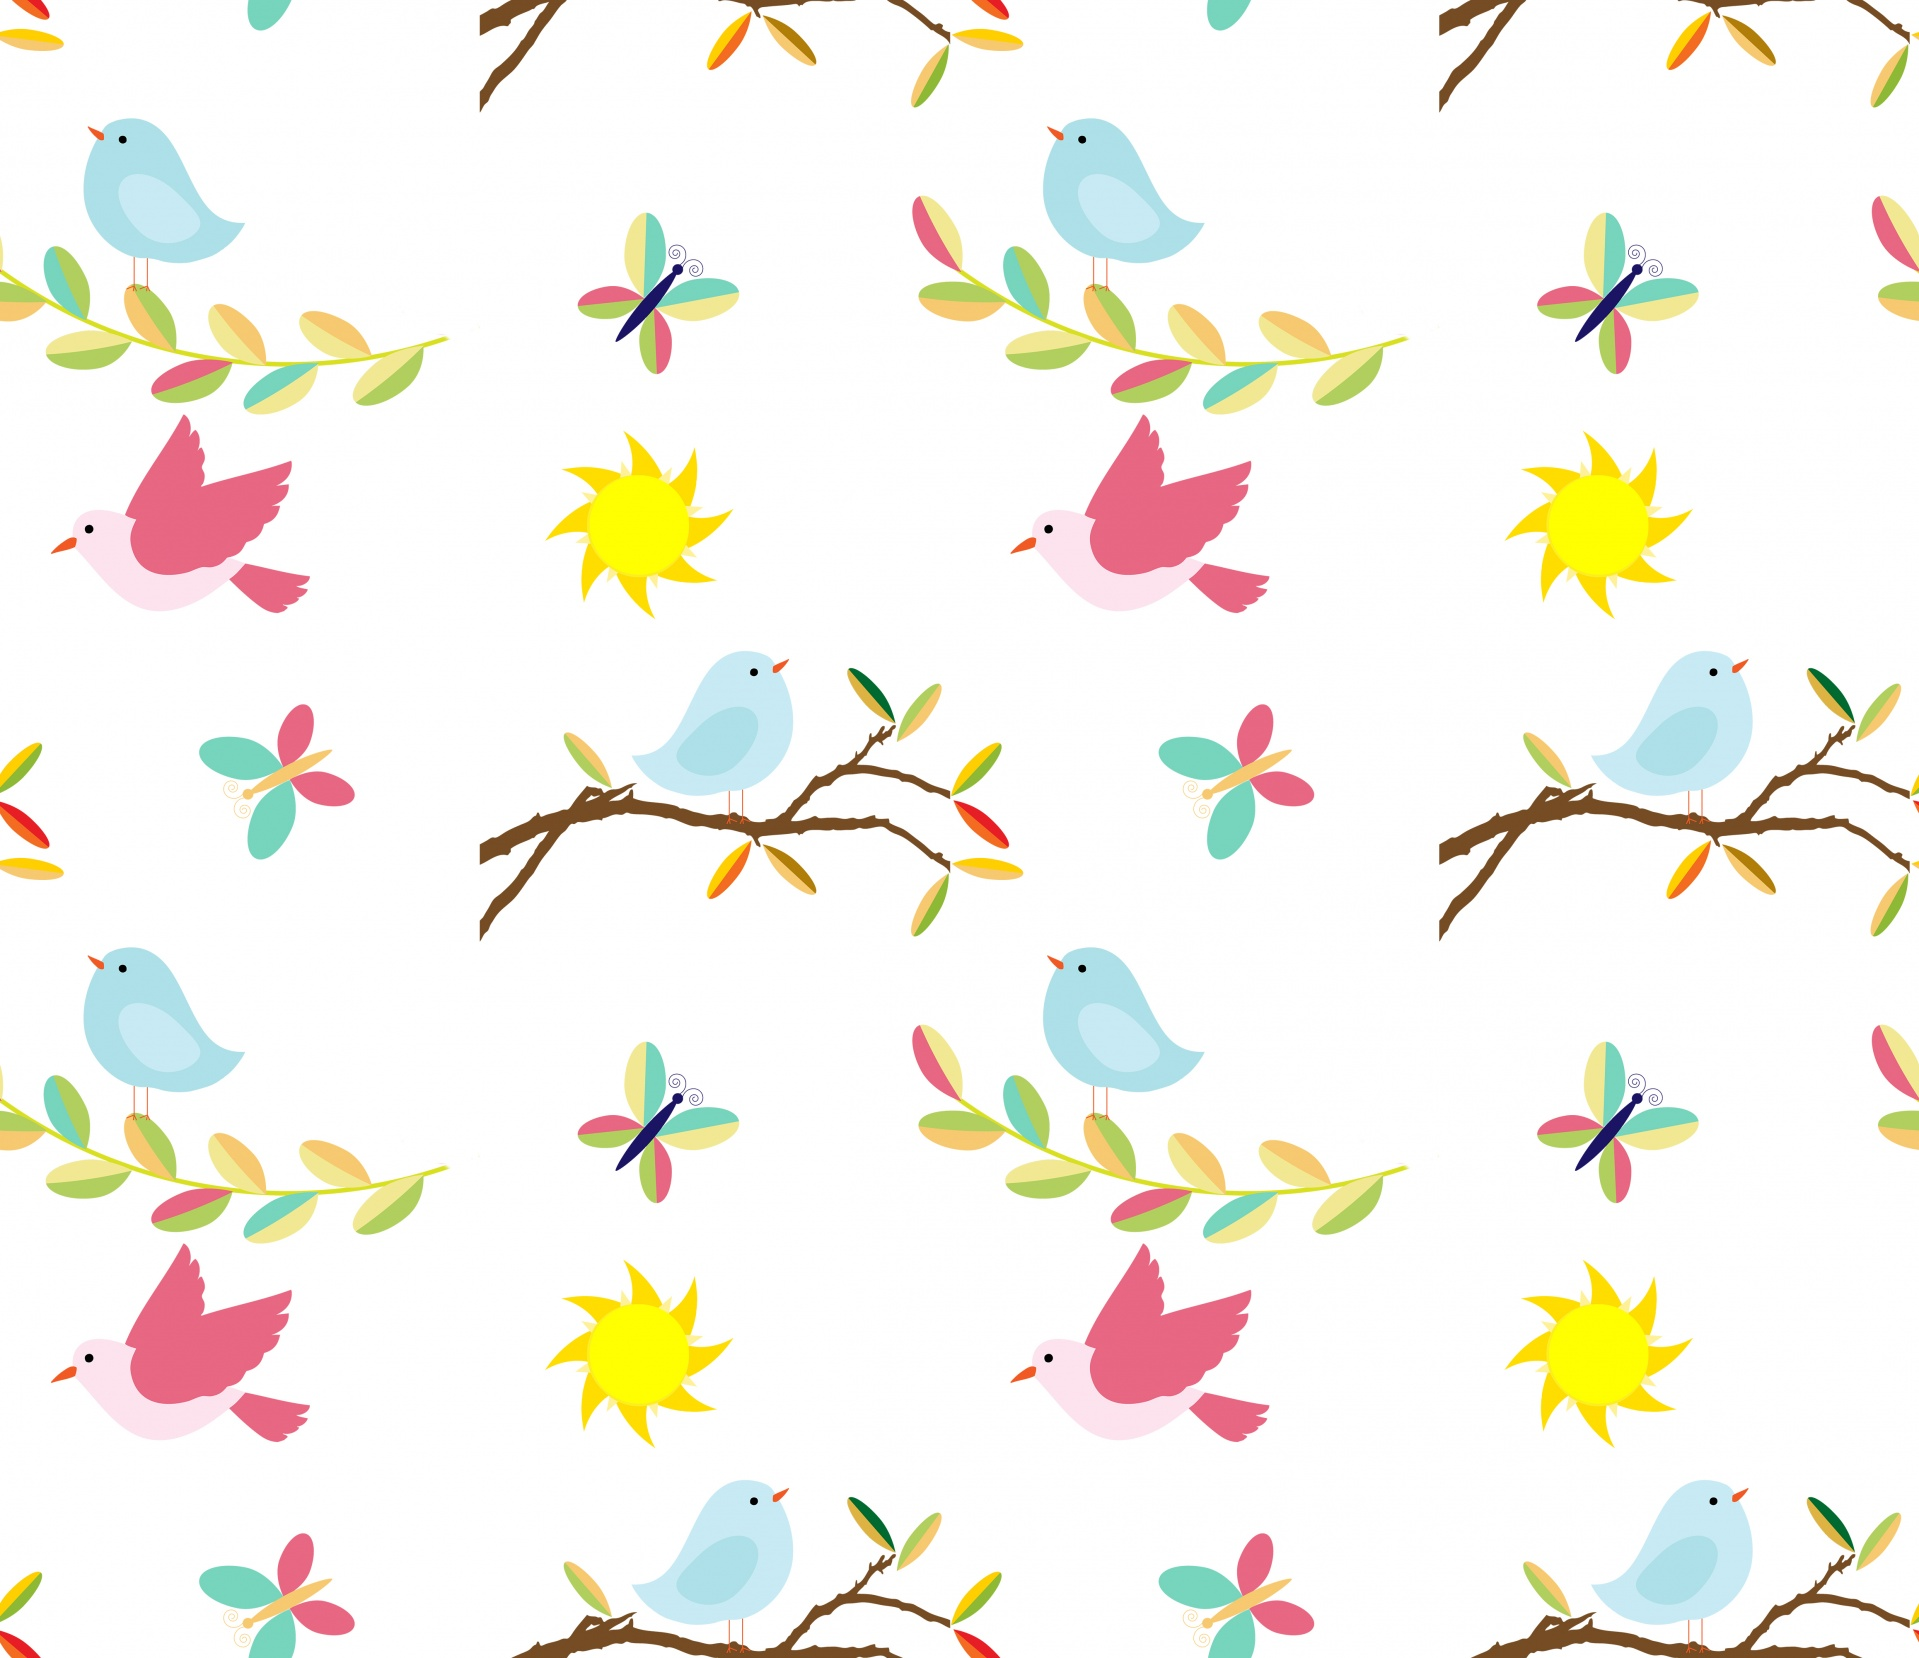 Birdsbirdcutebackgroundwallpaper Free Image From